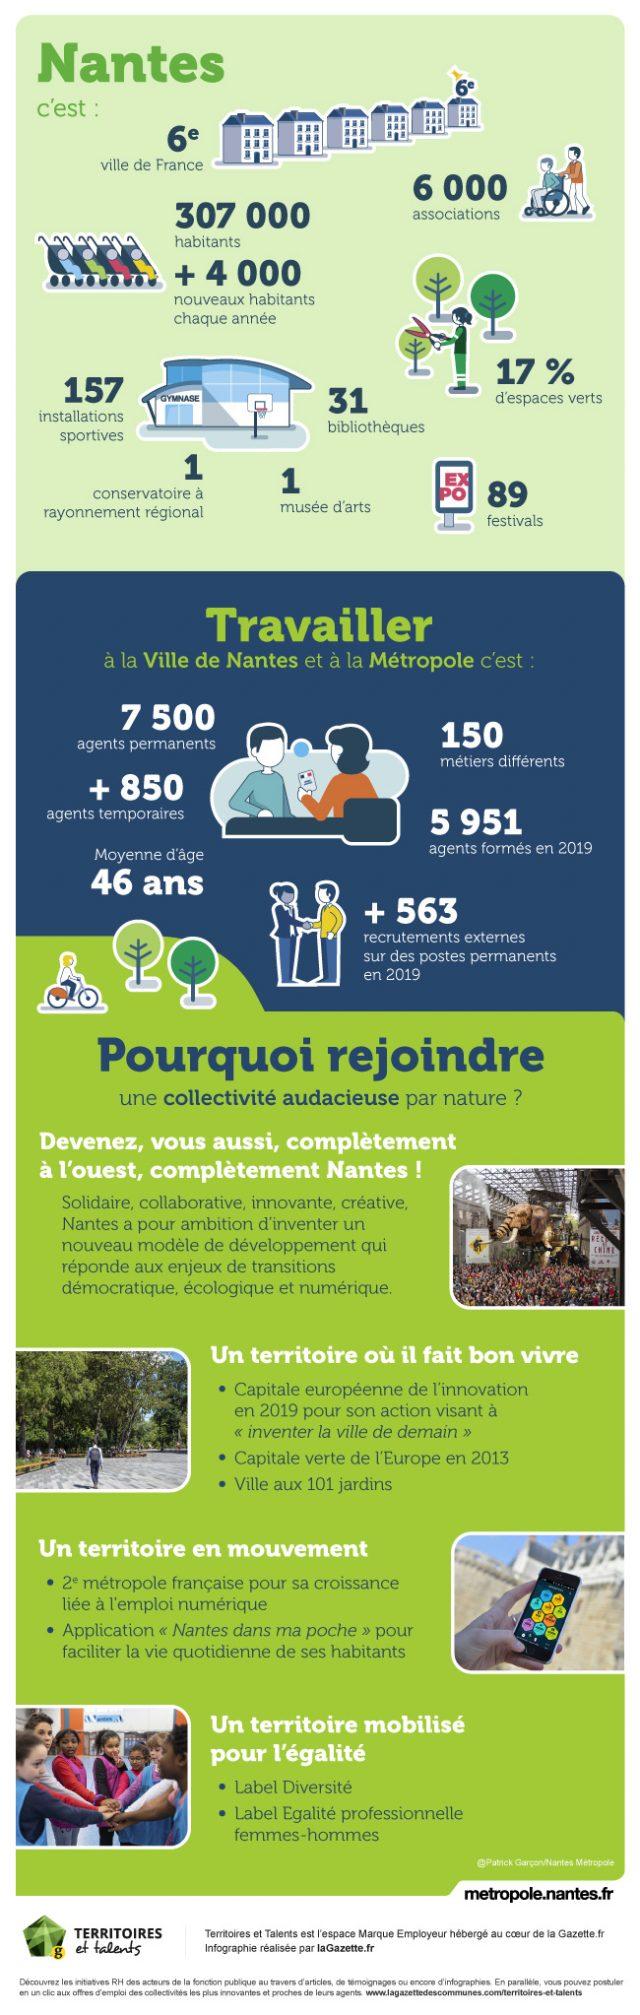 infographie_nantes_650px-B